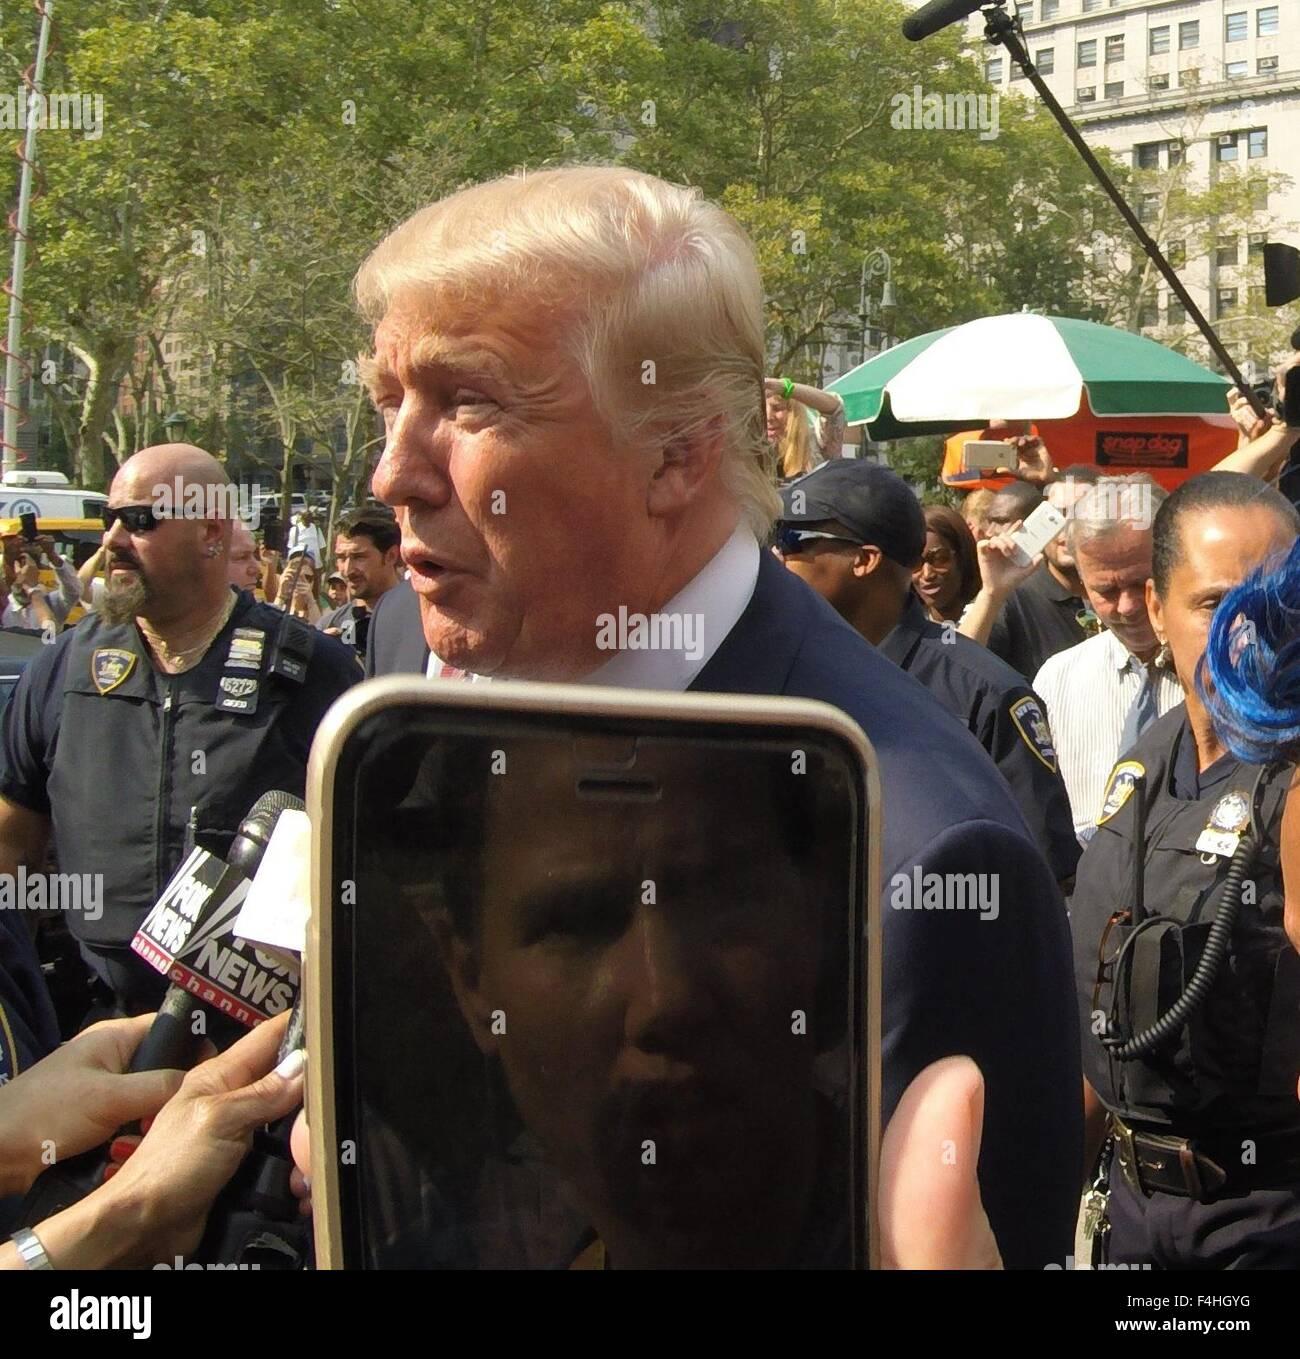 Donald Trump Leaving Jury Duty Stock Photos & Donald Trump Leaving